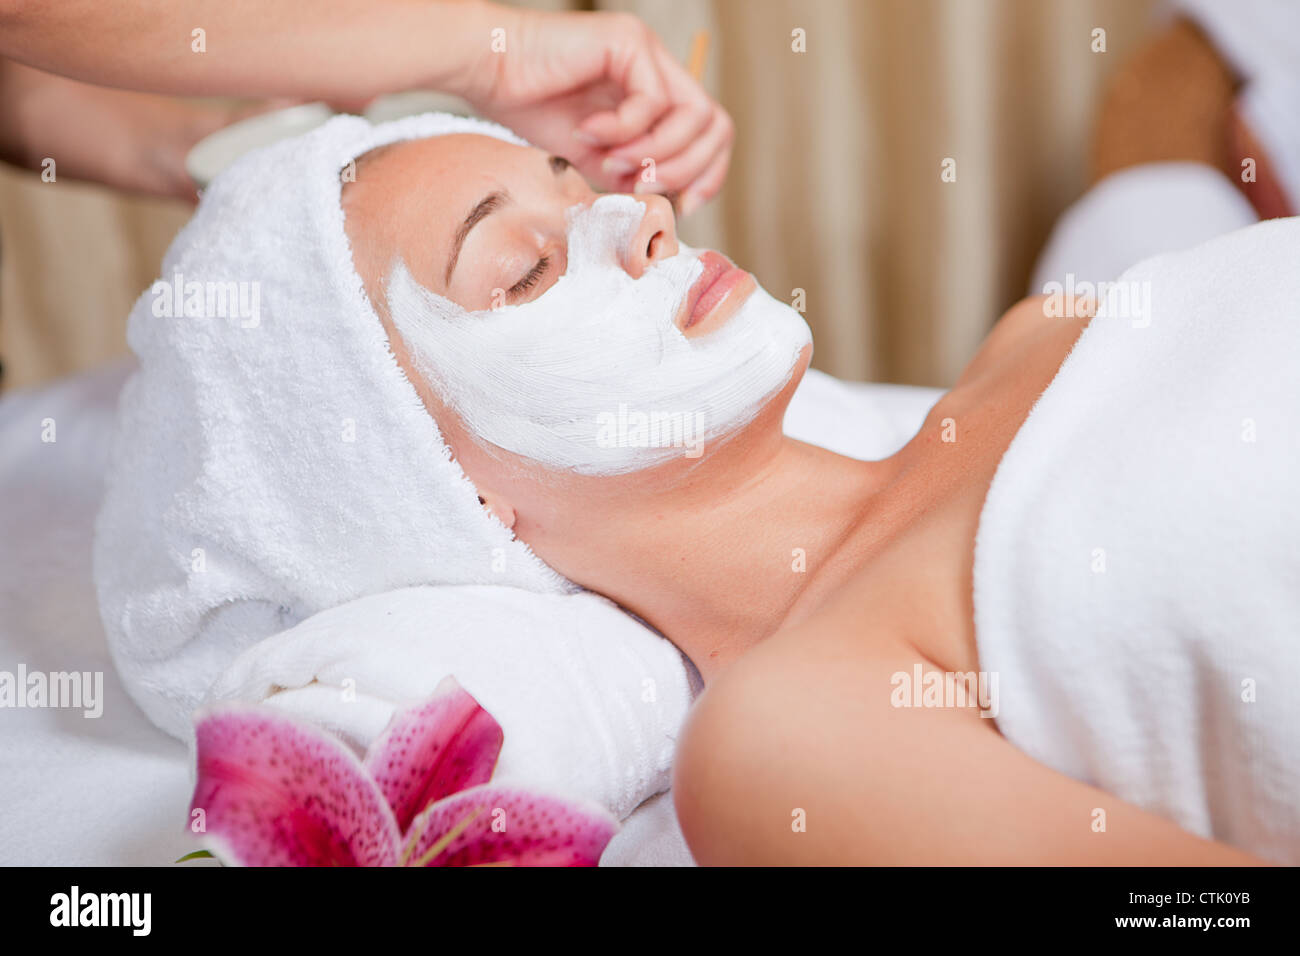 skin care, beautician applying face mask cream - Stock Image